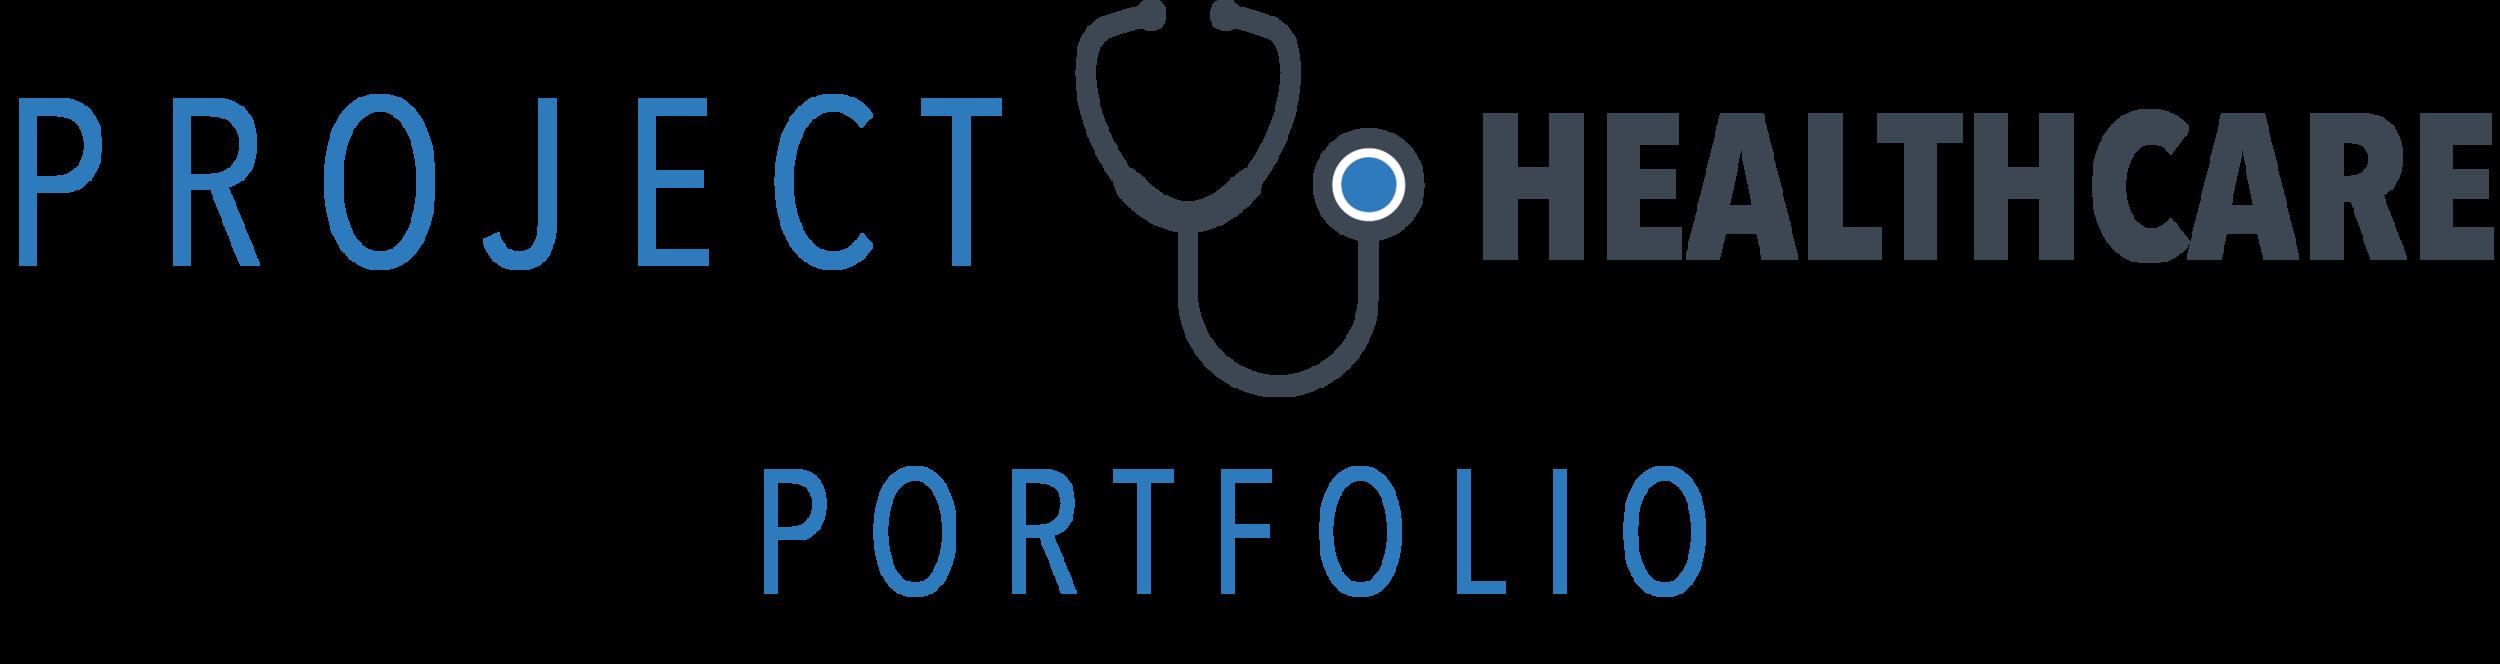 ph portfolio logo.png